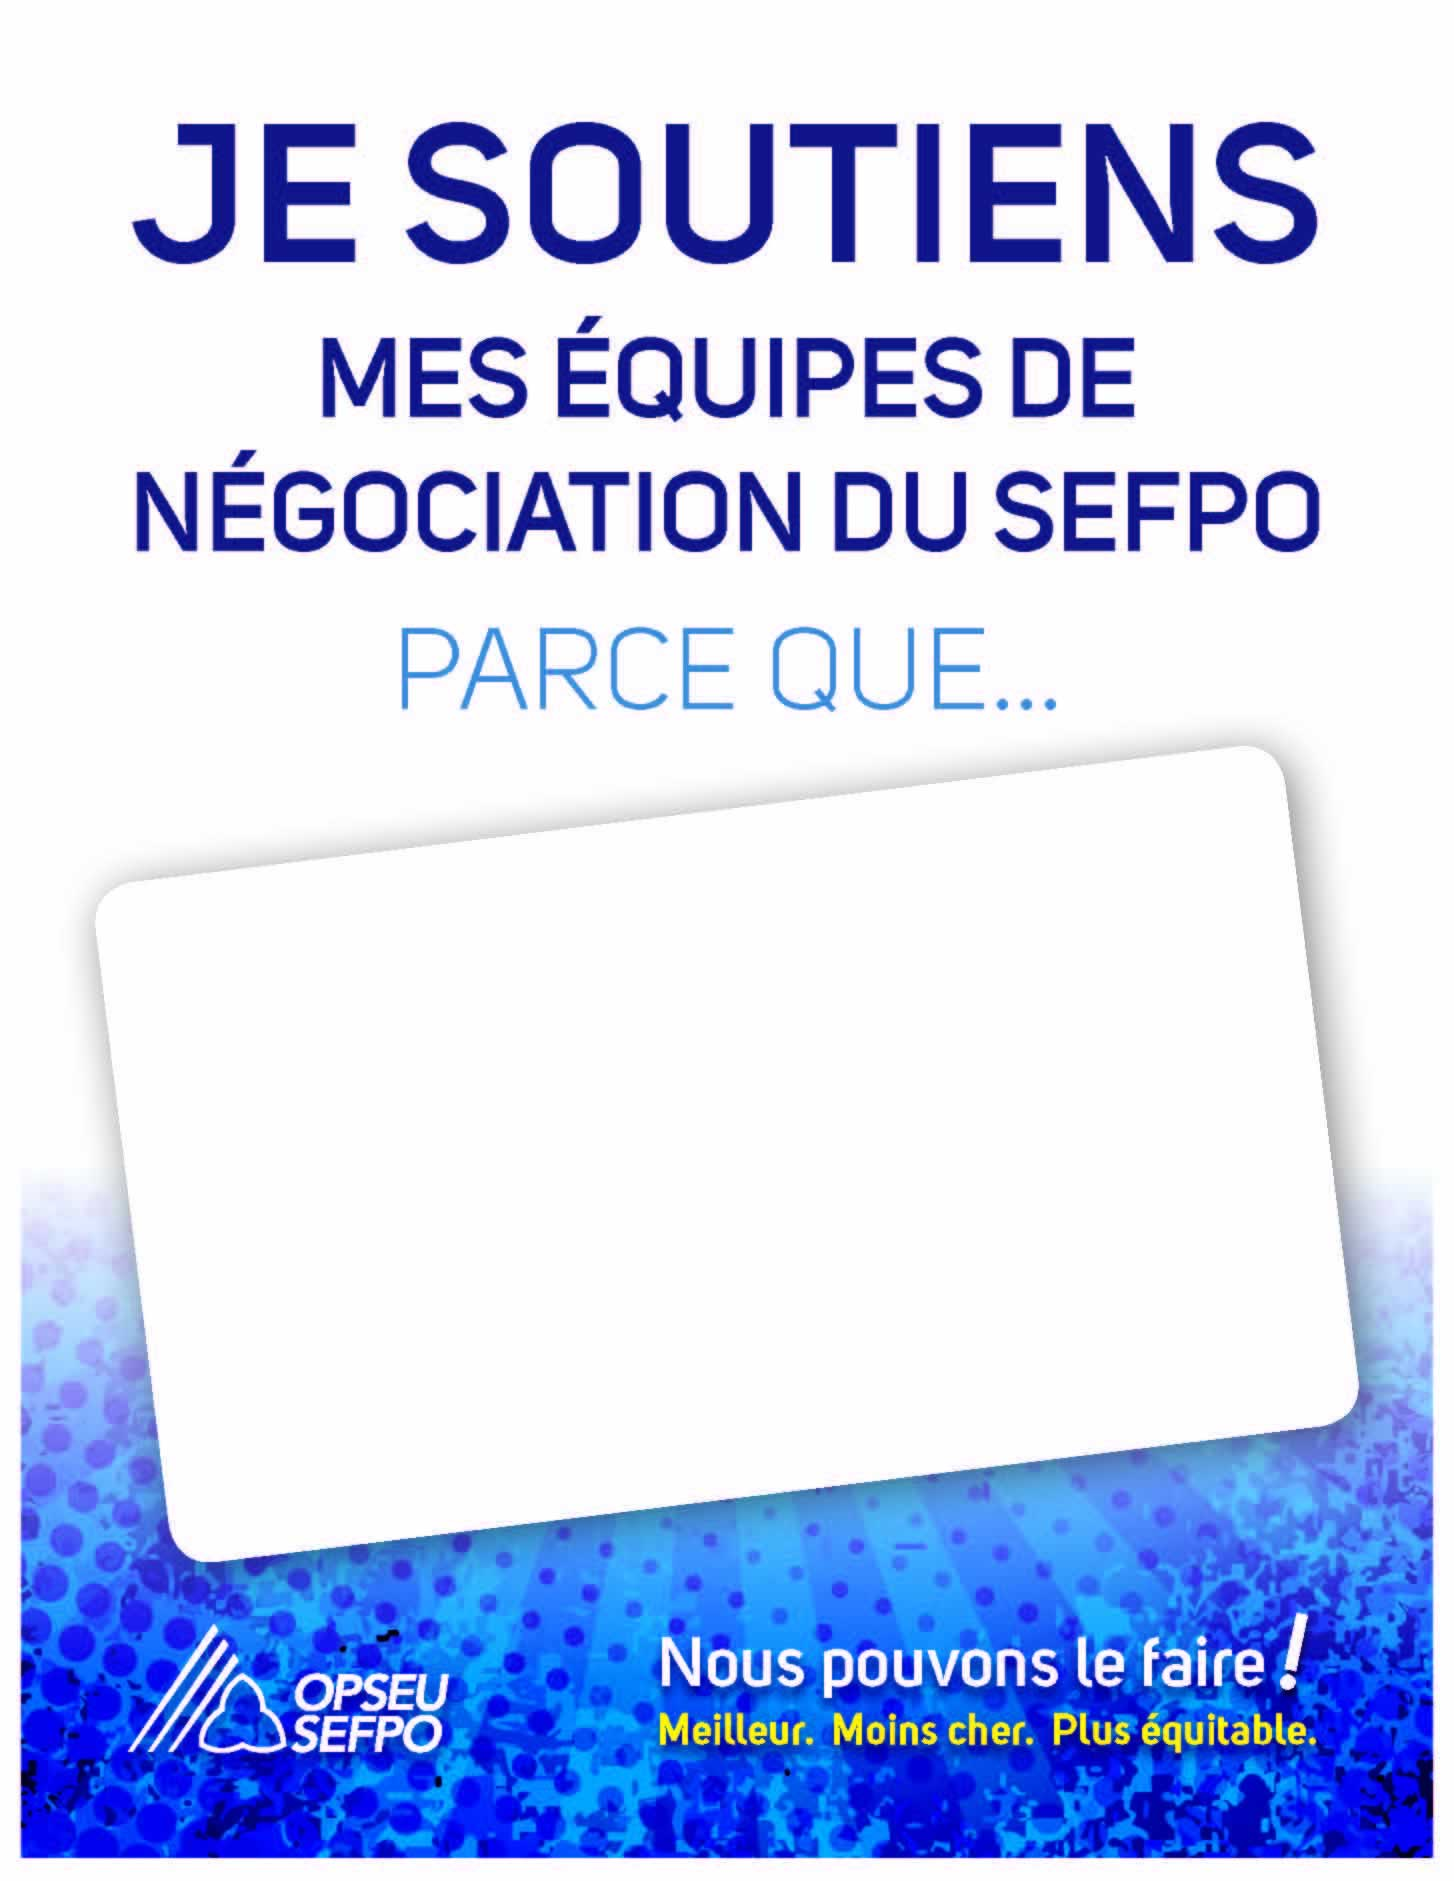 2015-02_ops_fr_i_support_opseu_poster_c.jpg